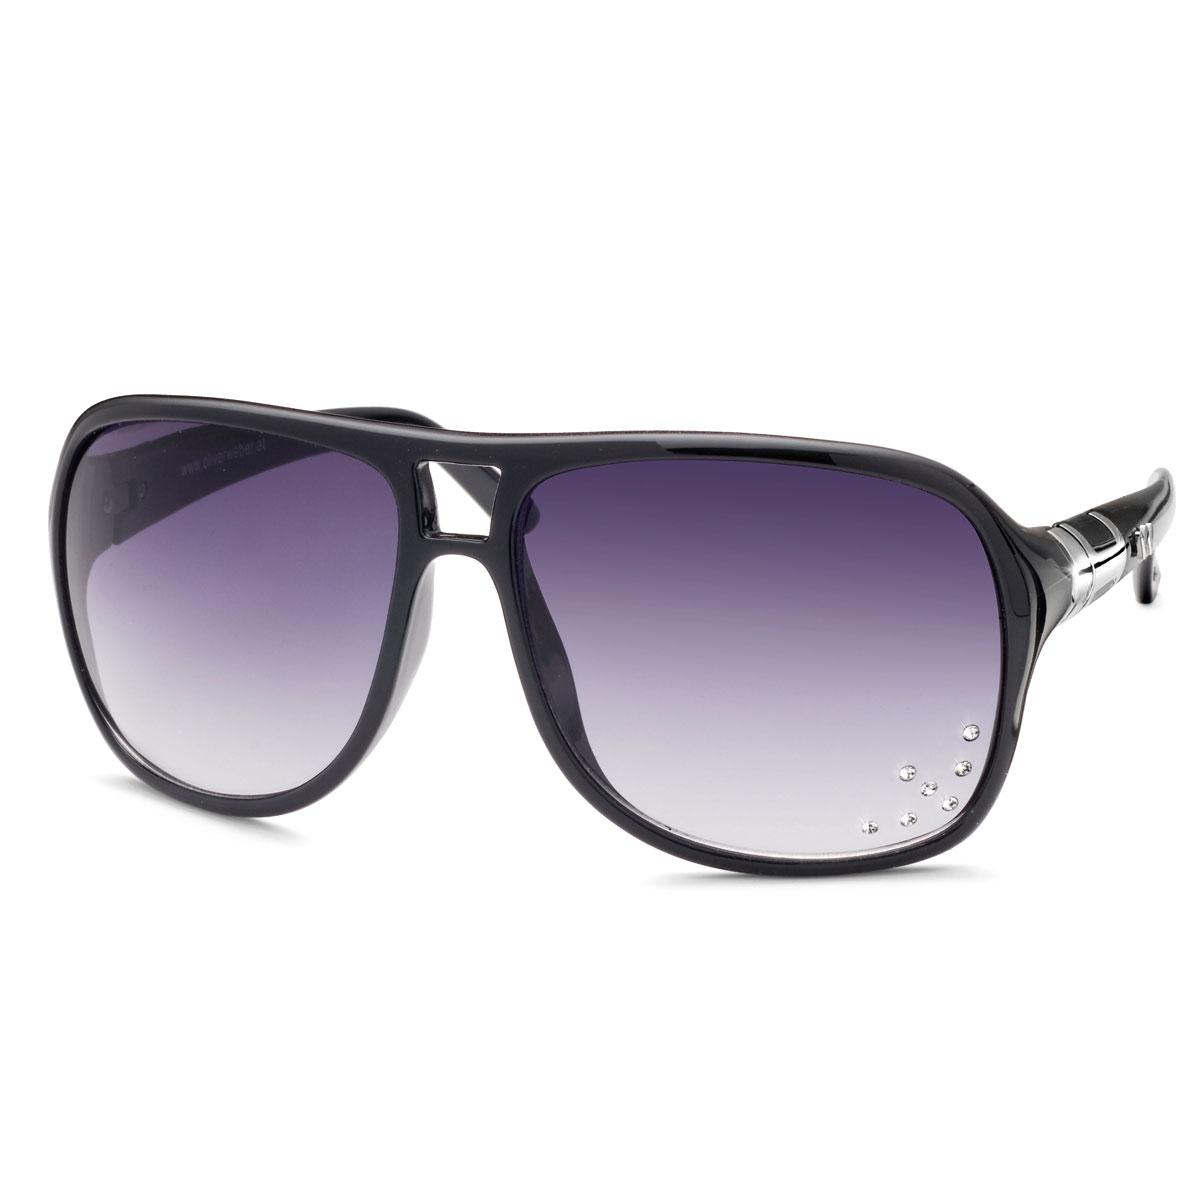 عینک آفتابی مدل آلاباما مشکی